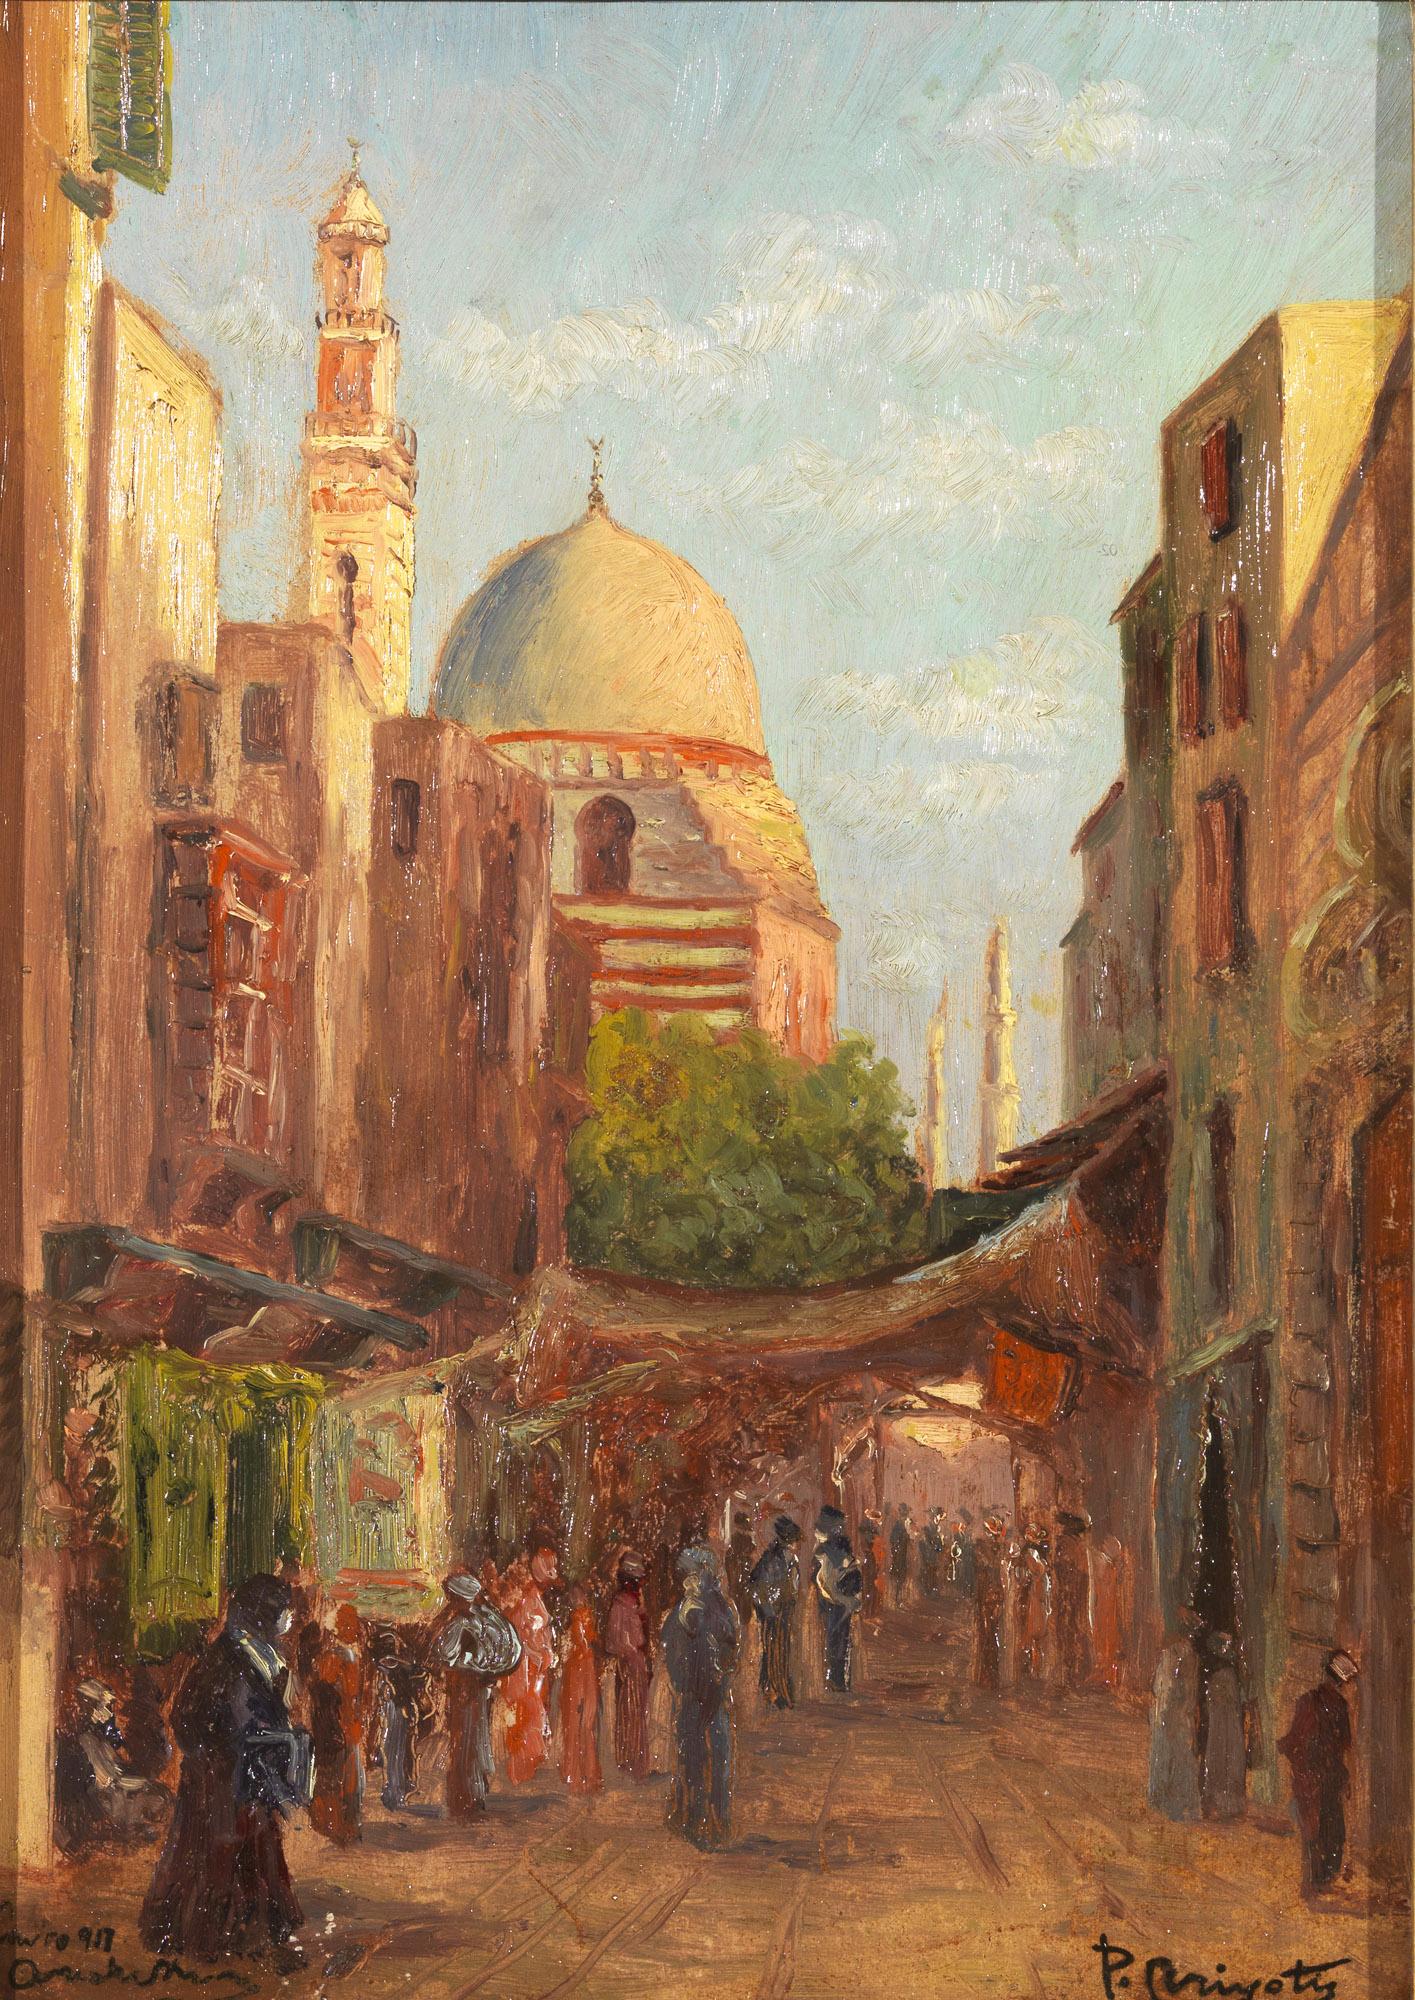 Pericles Tsirigotis - Cairo